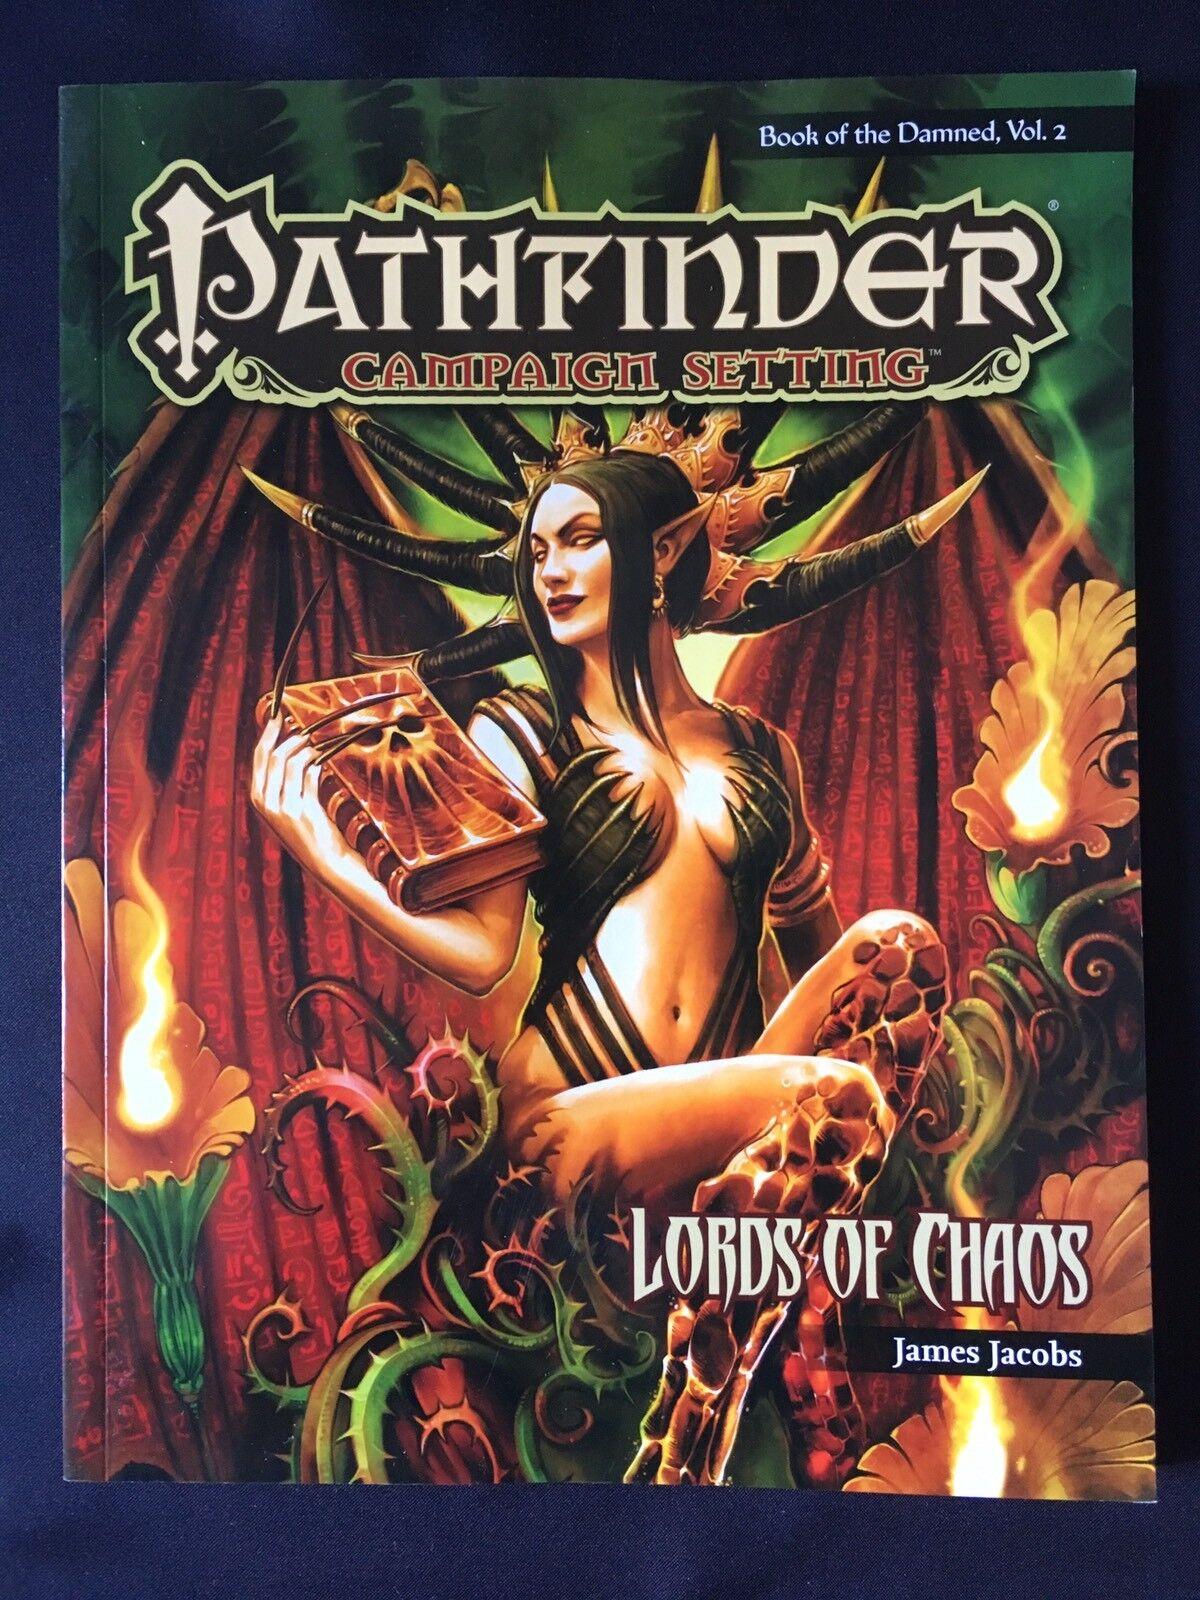 SIGNORI DI CAOS-Pathfinder-LIBRO DEI DANNATI volume 2-James Jacobs